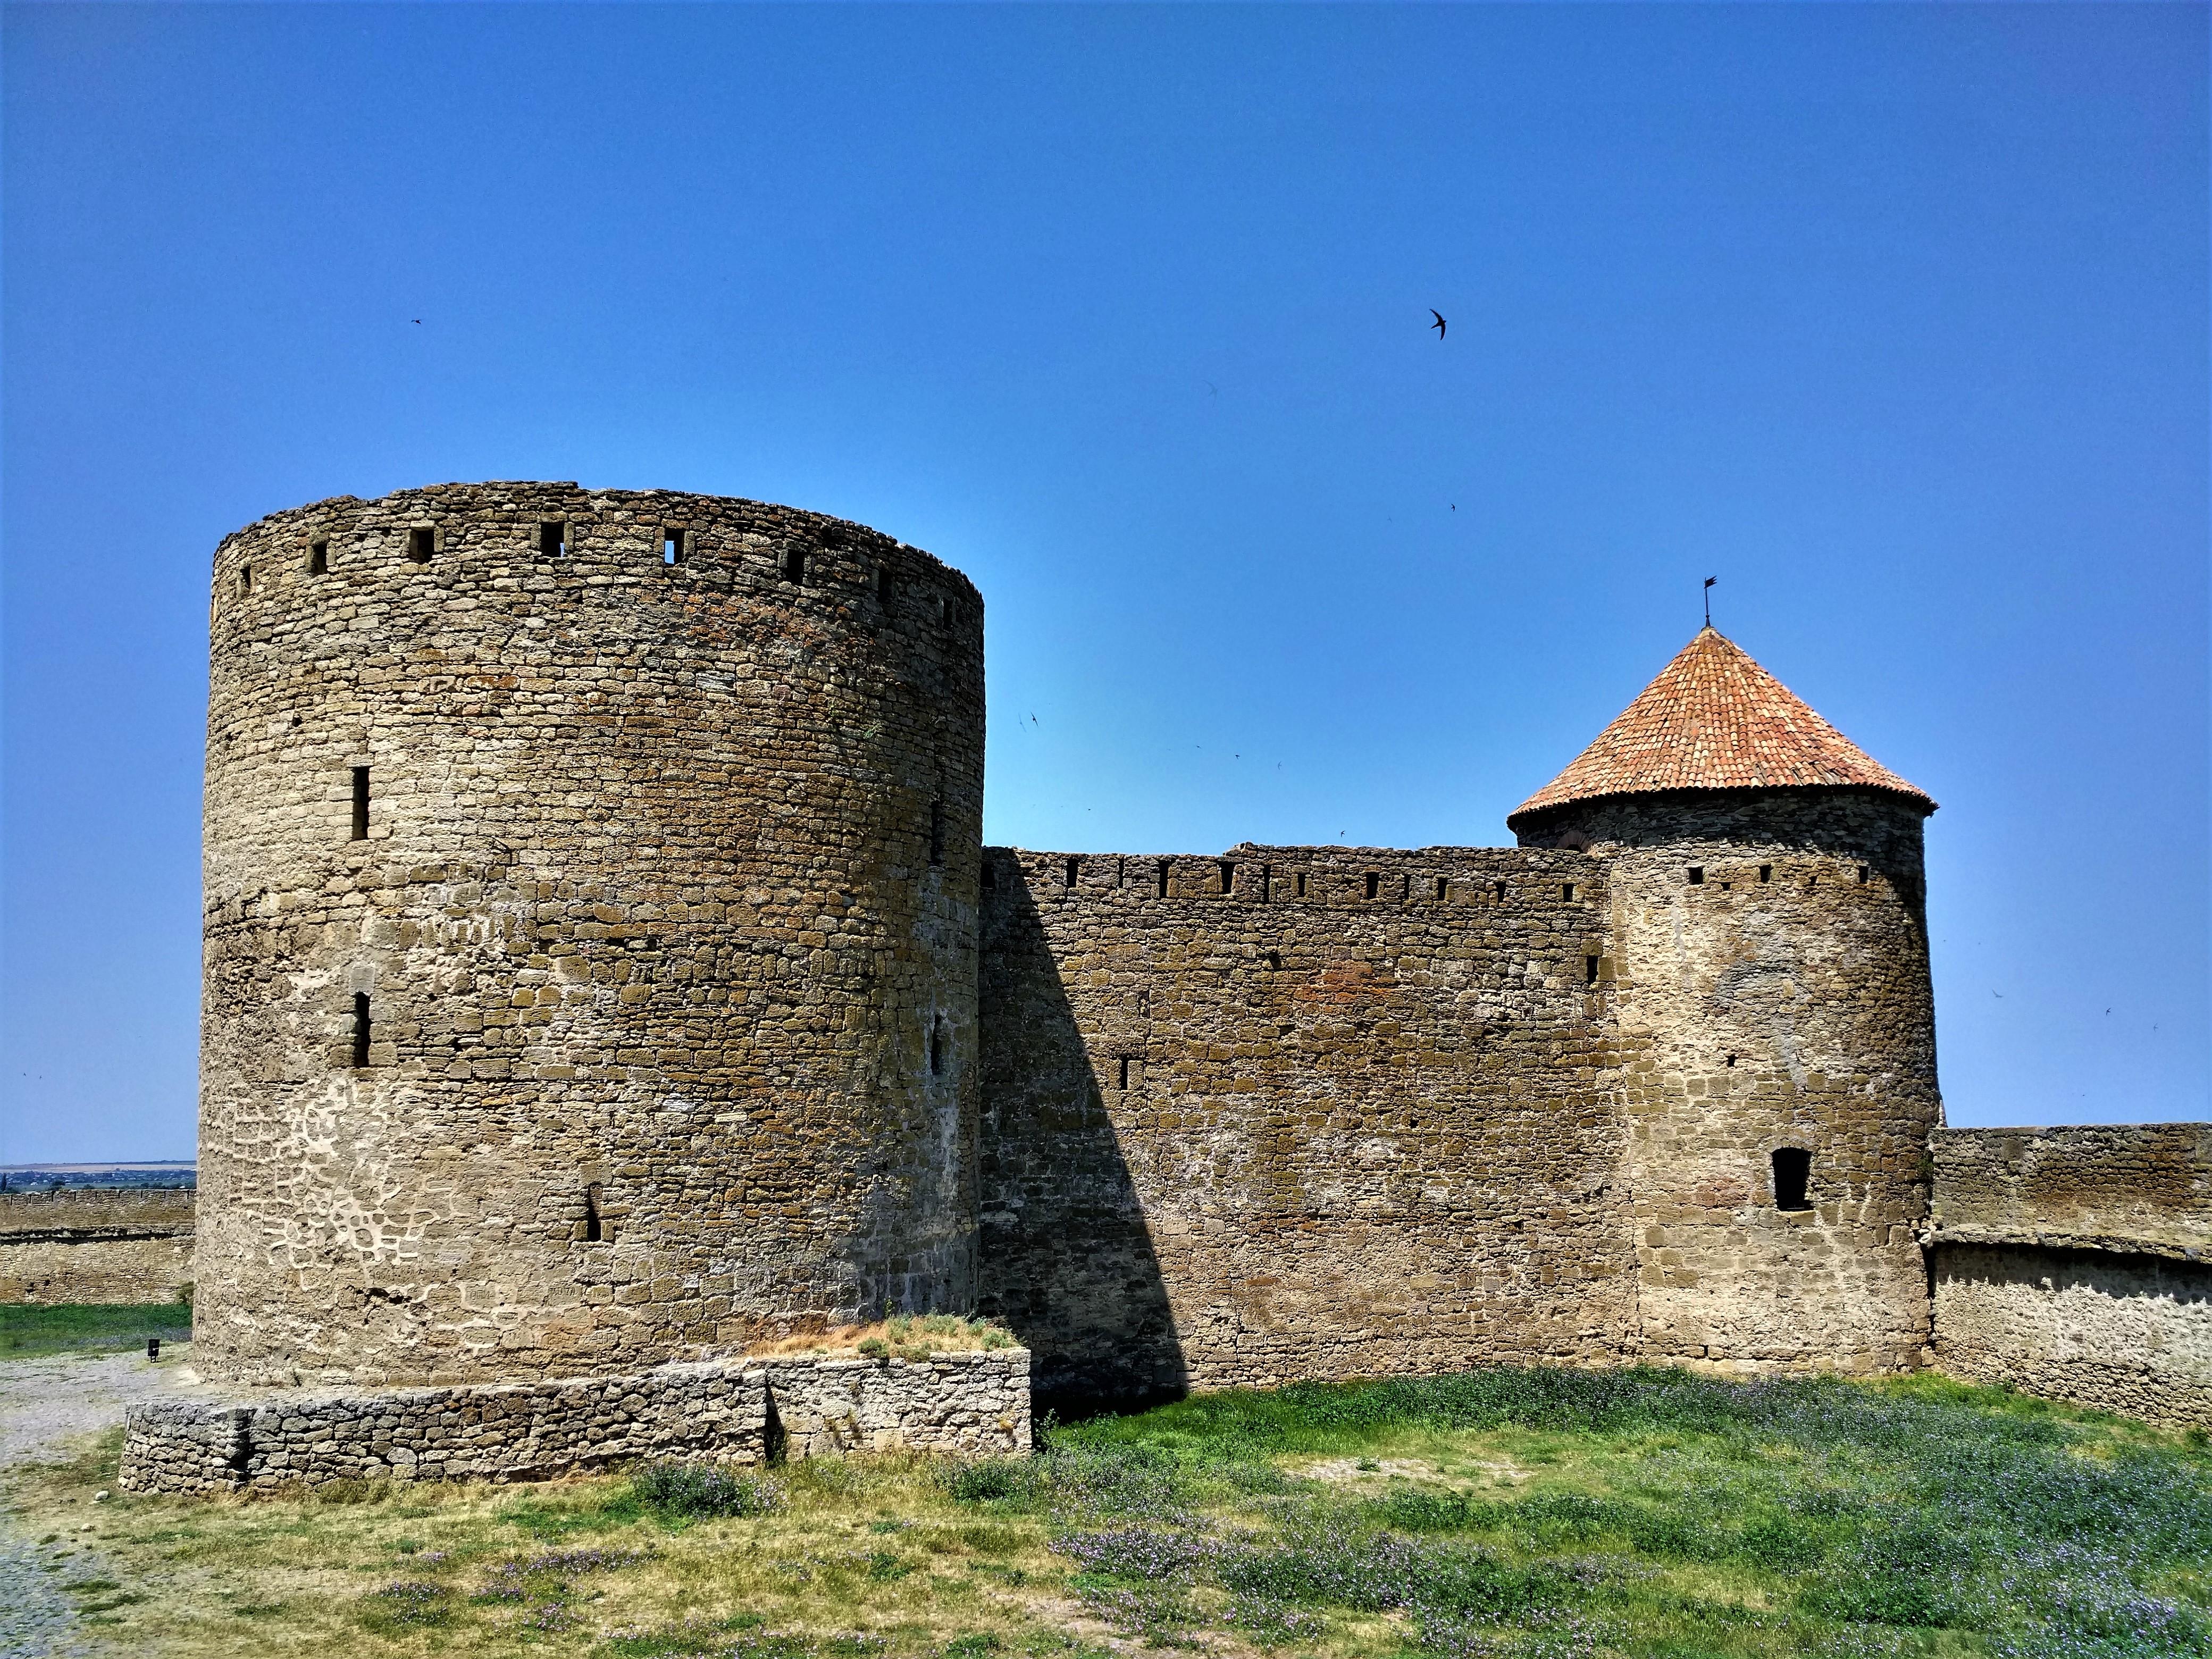 Akkerman Fortress: description, history 76